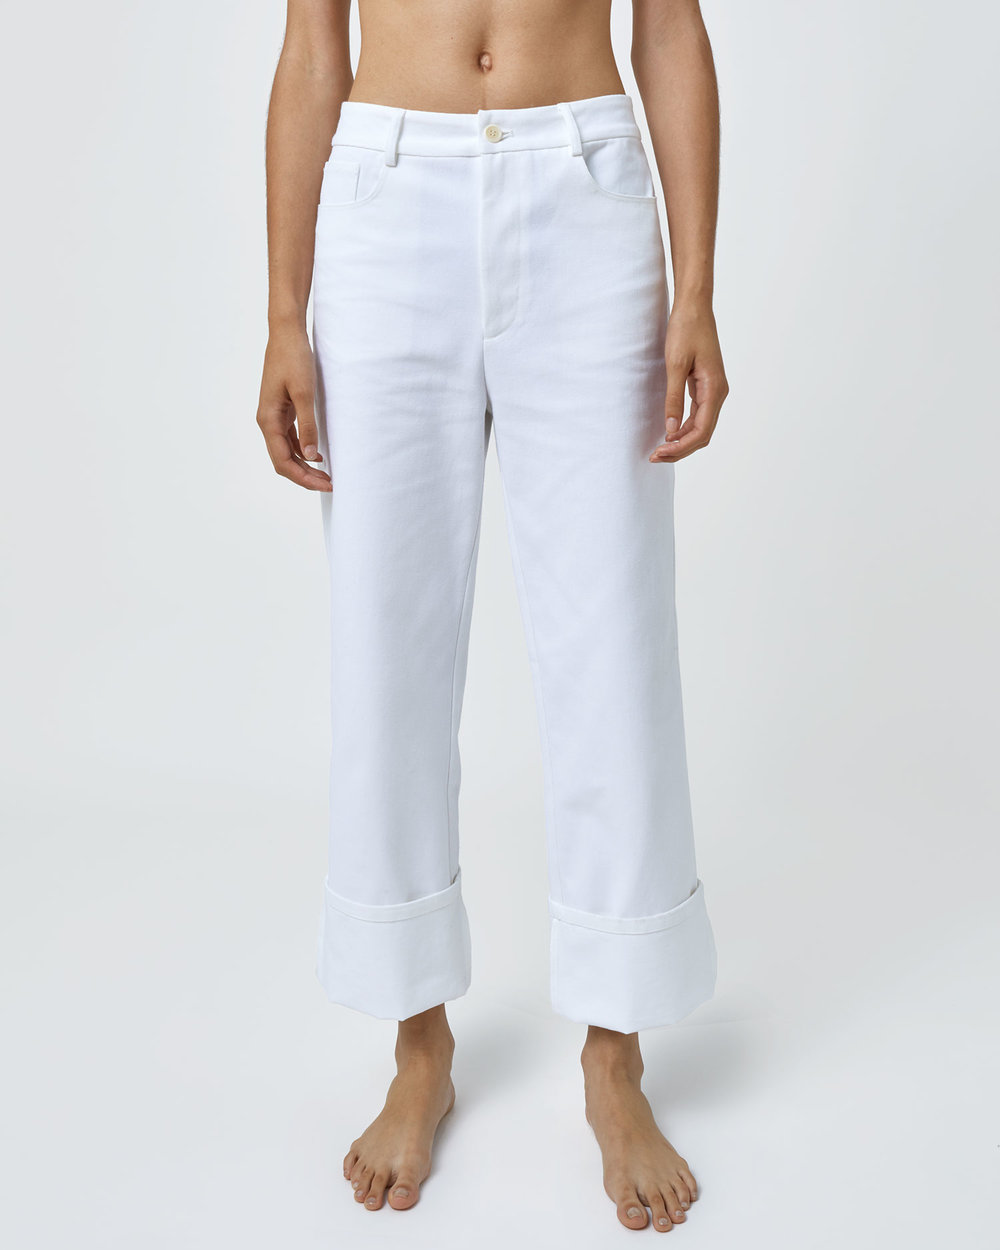 Shop One DNA White Denim Jean with Folded Cuffs